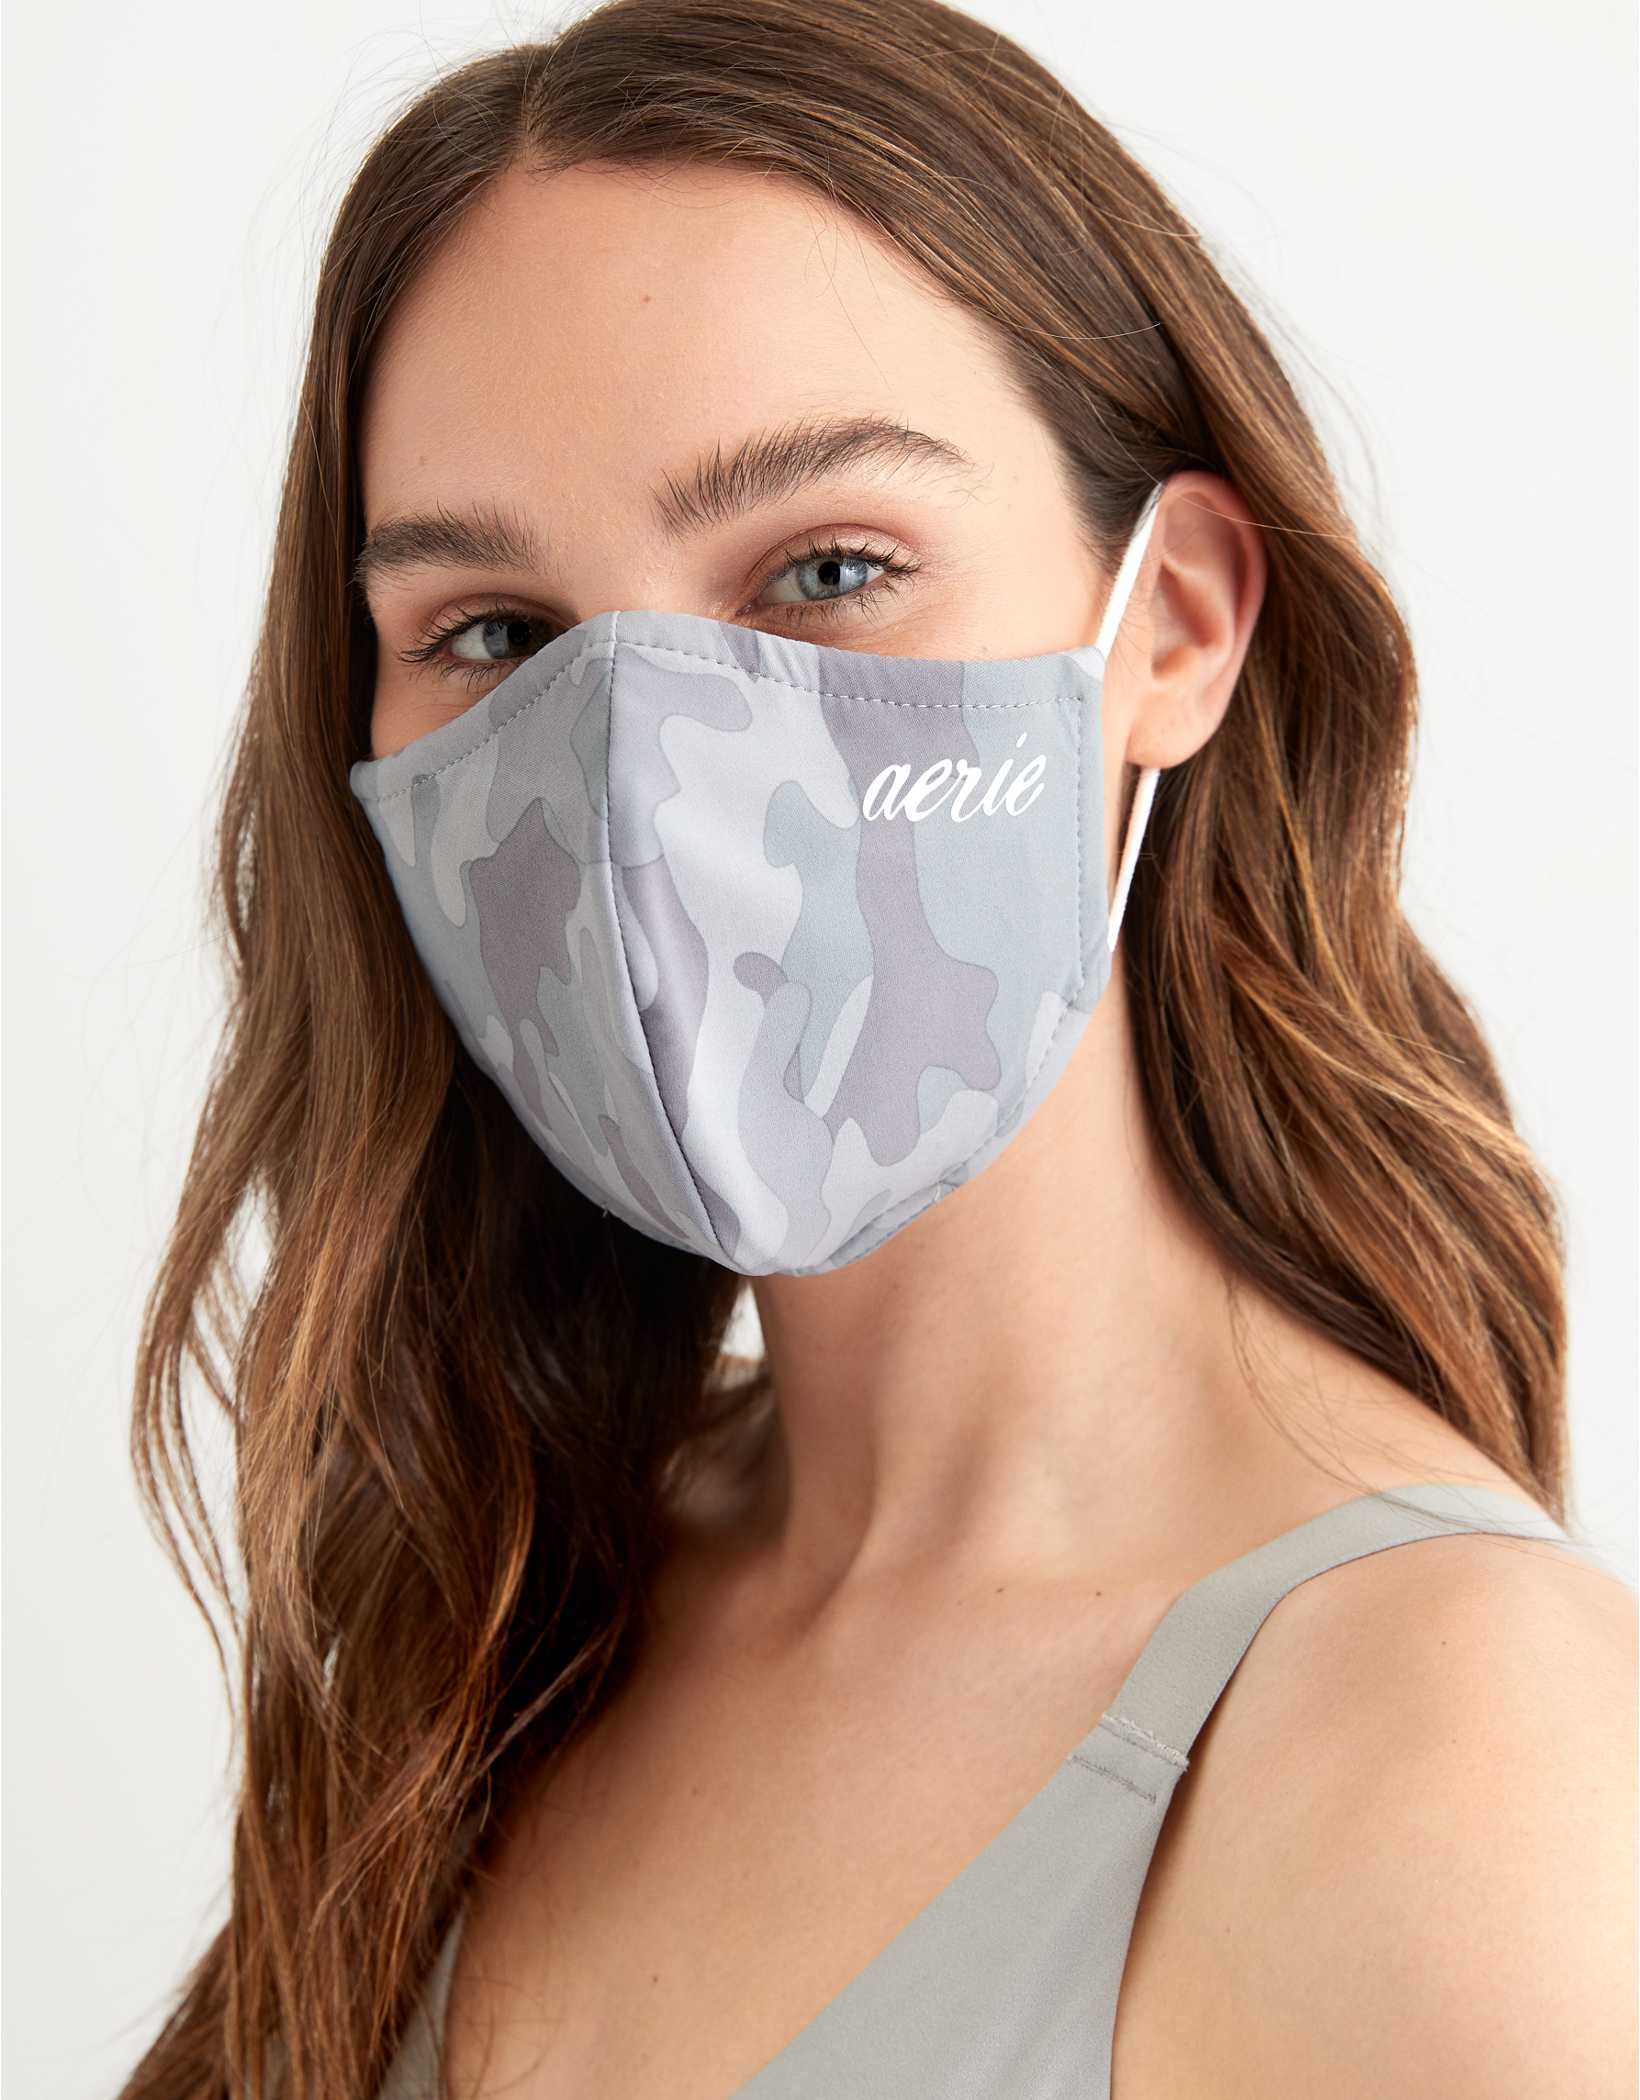 Aerie Reusable Face Mask